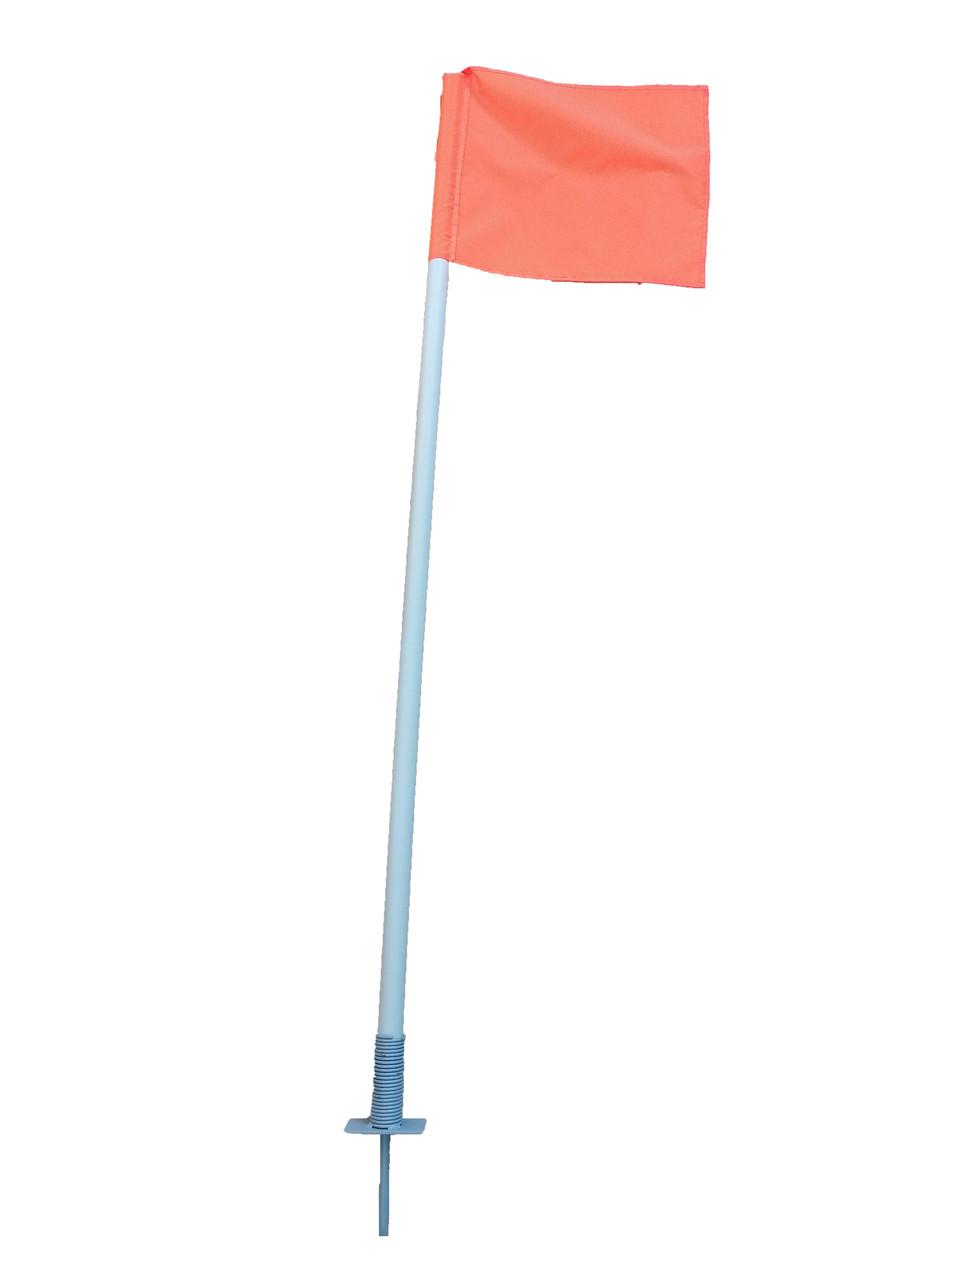 Комплект угловых флагов  на пружинах (YT-6000)